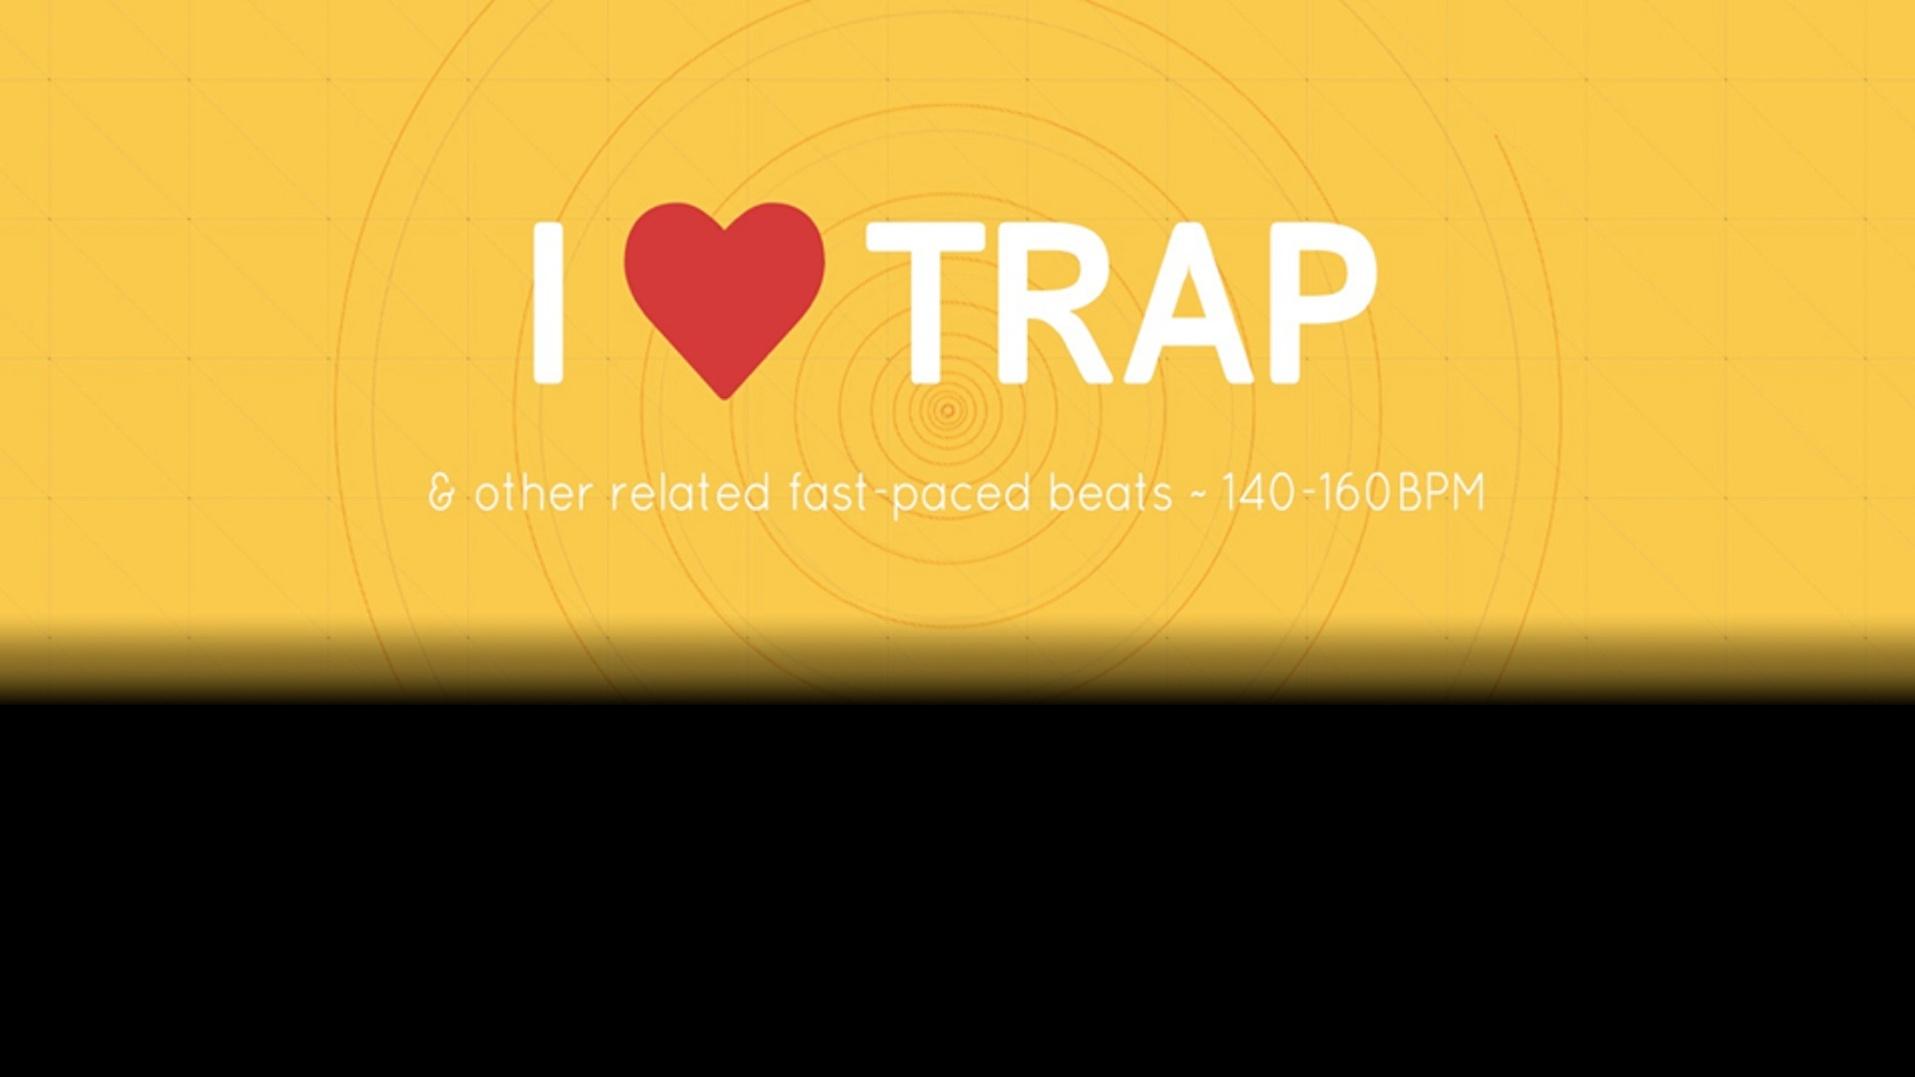 I ❤ Trap